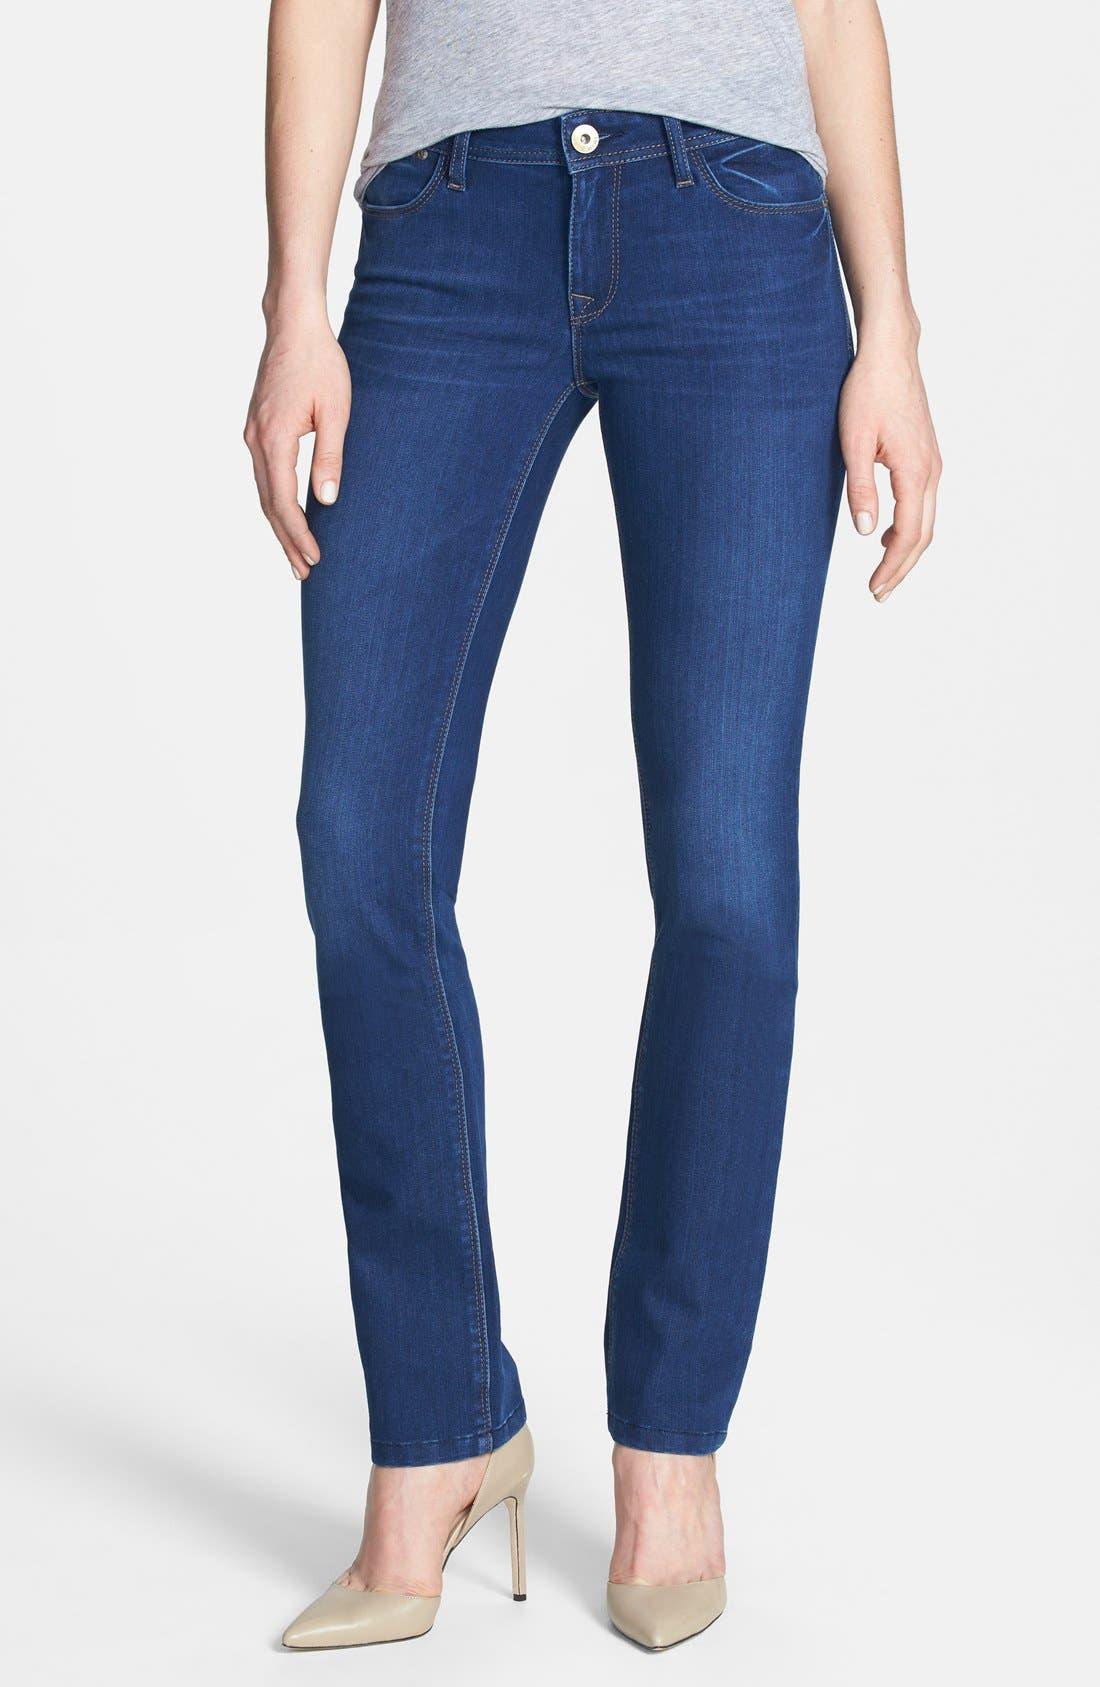 Main Image - DL1961 'Grace' Straight Jeans (Dyer)